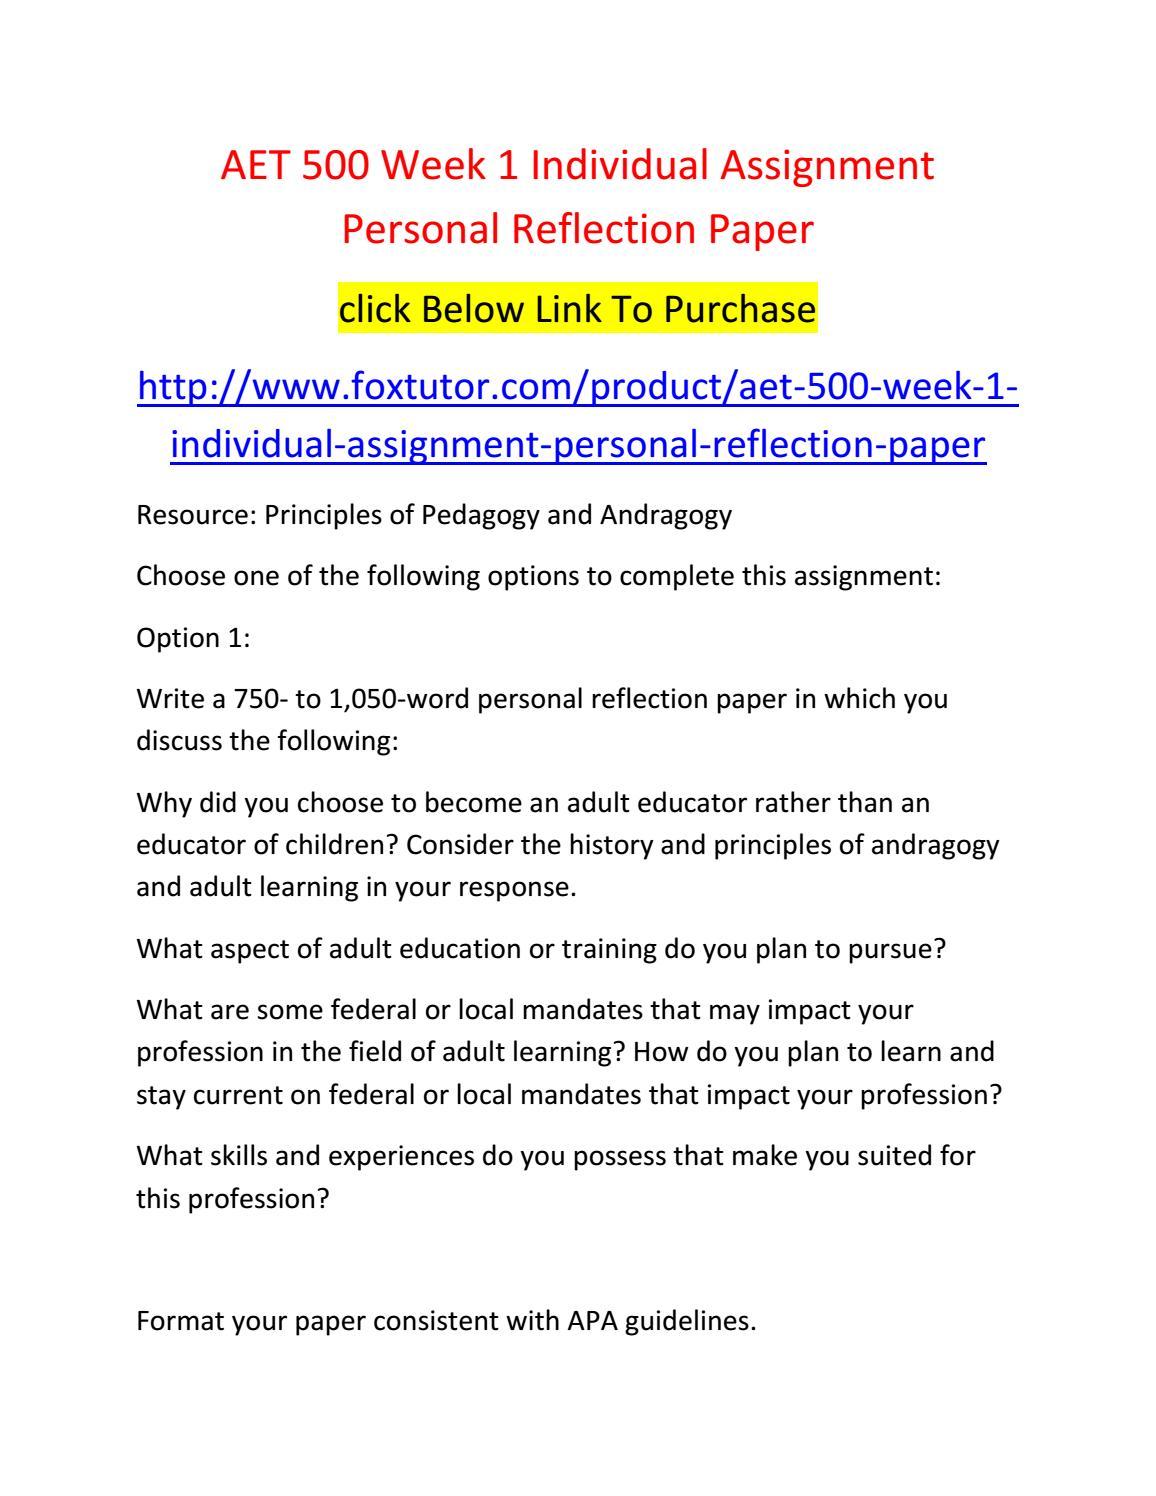 essay practice book example